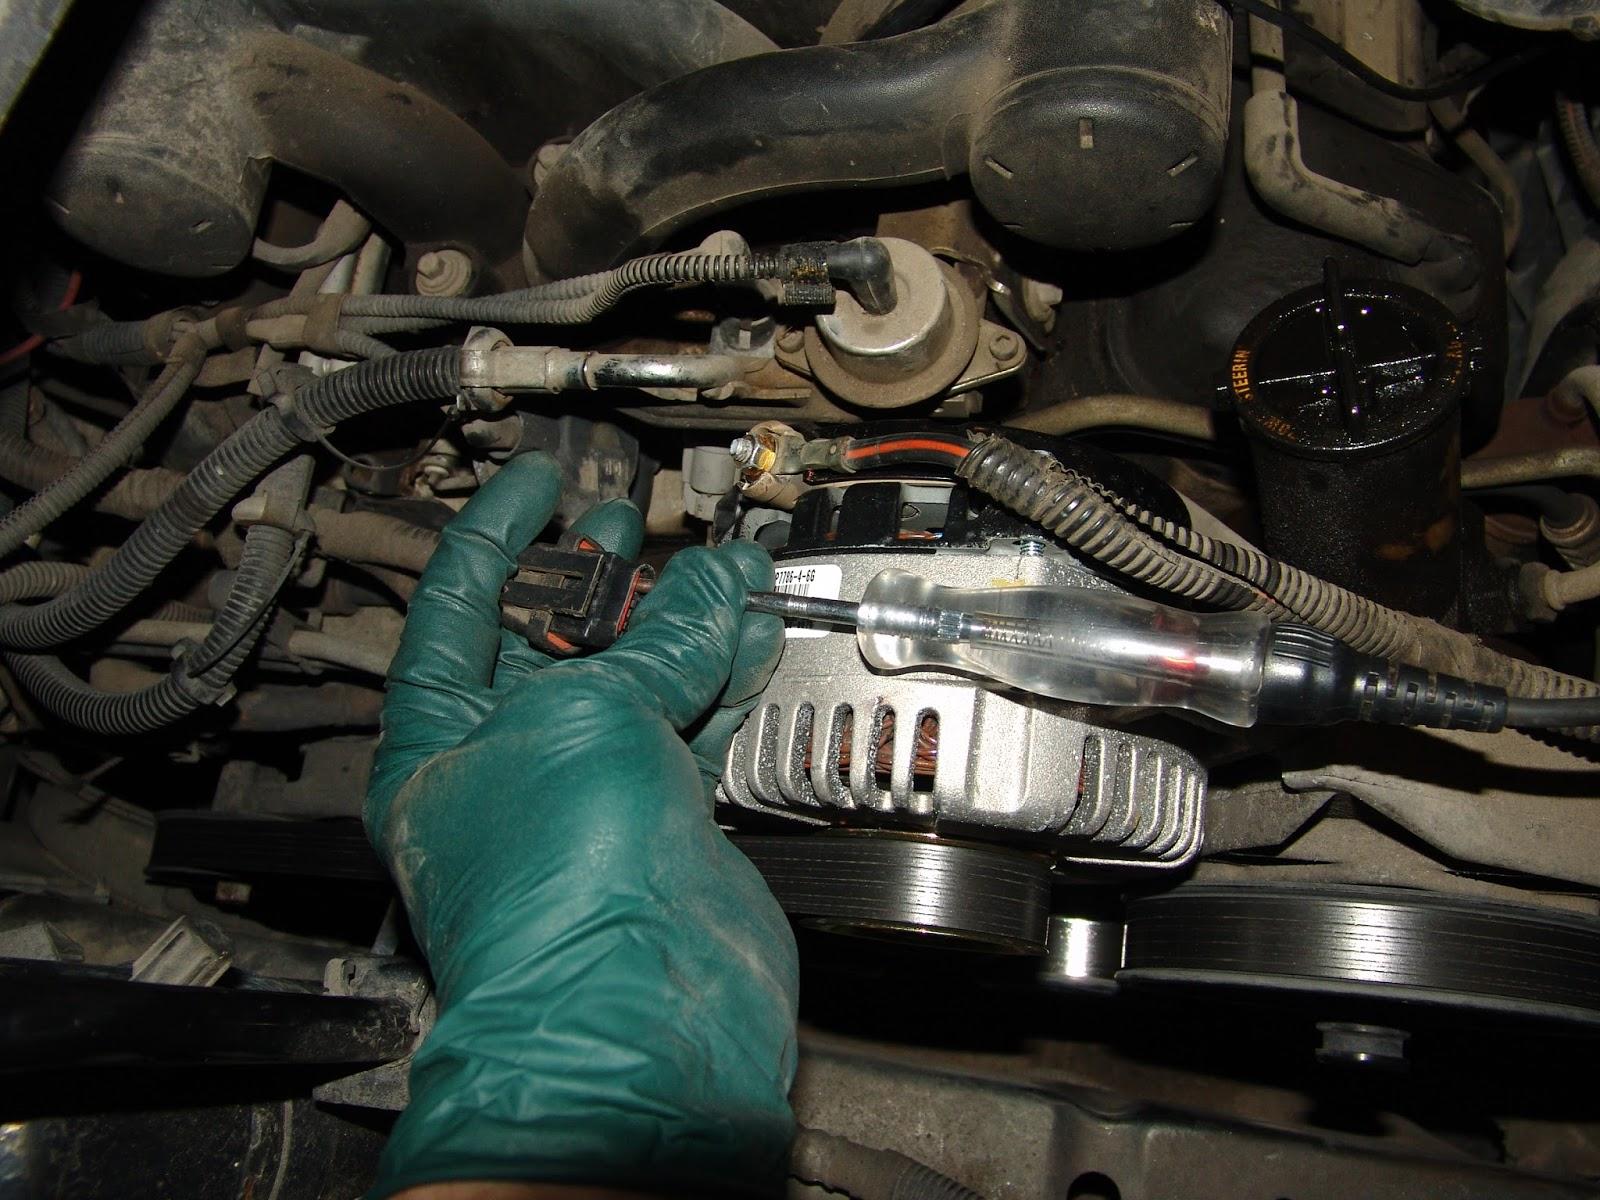 2000 hyundai elantra fuel pump wiring diagram vw jetta fuse parts free engine image